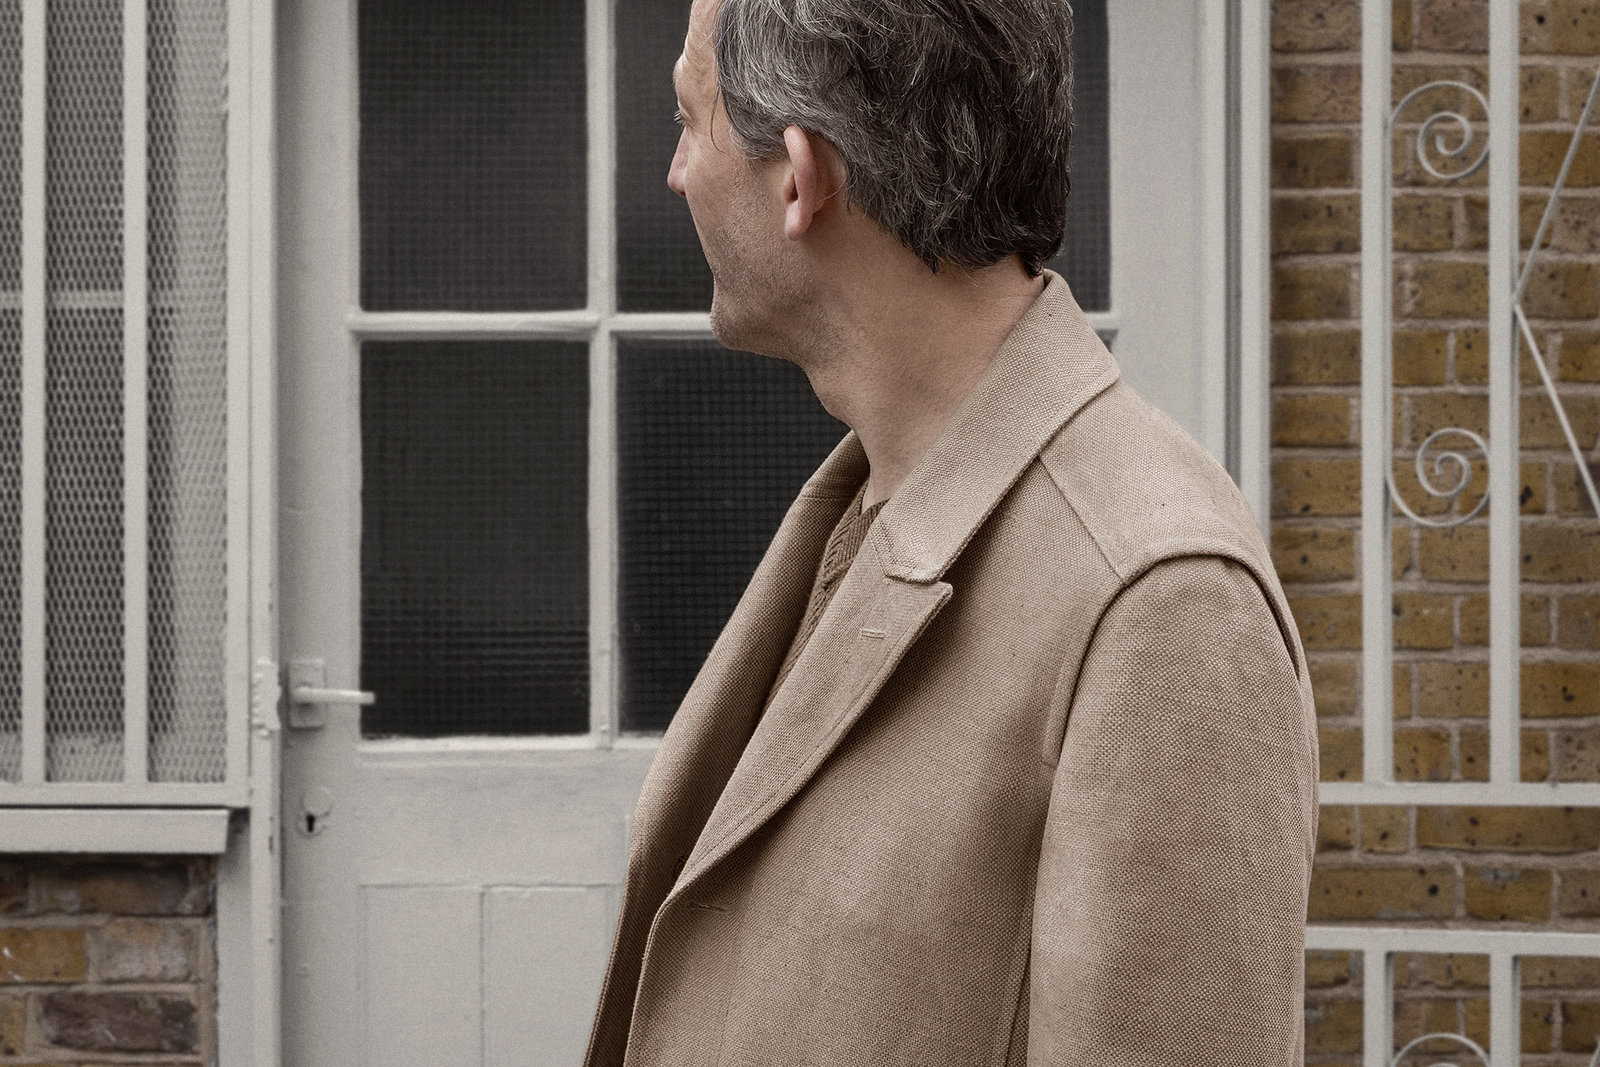 shopcoat-cotton-linen-hopsack-malt-worn-2@2x.jpg